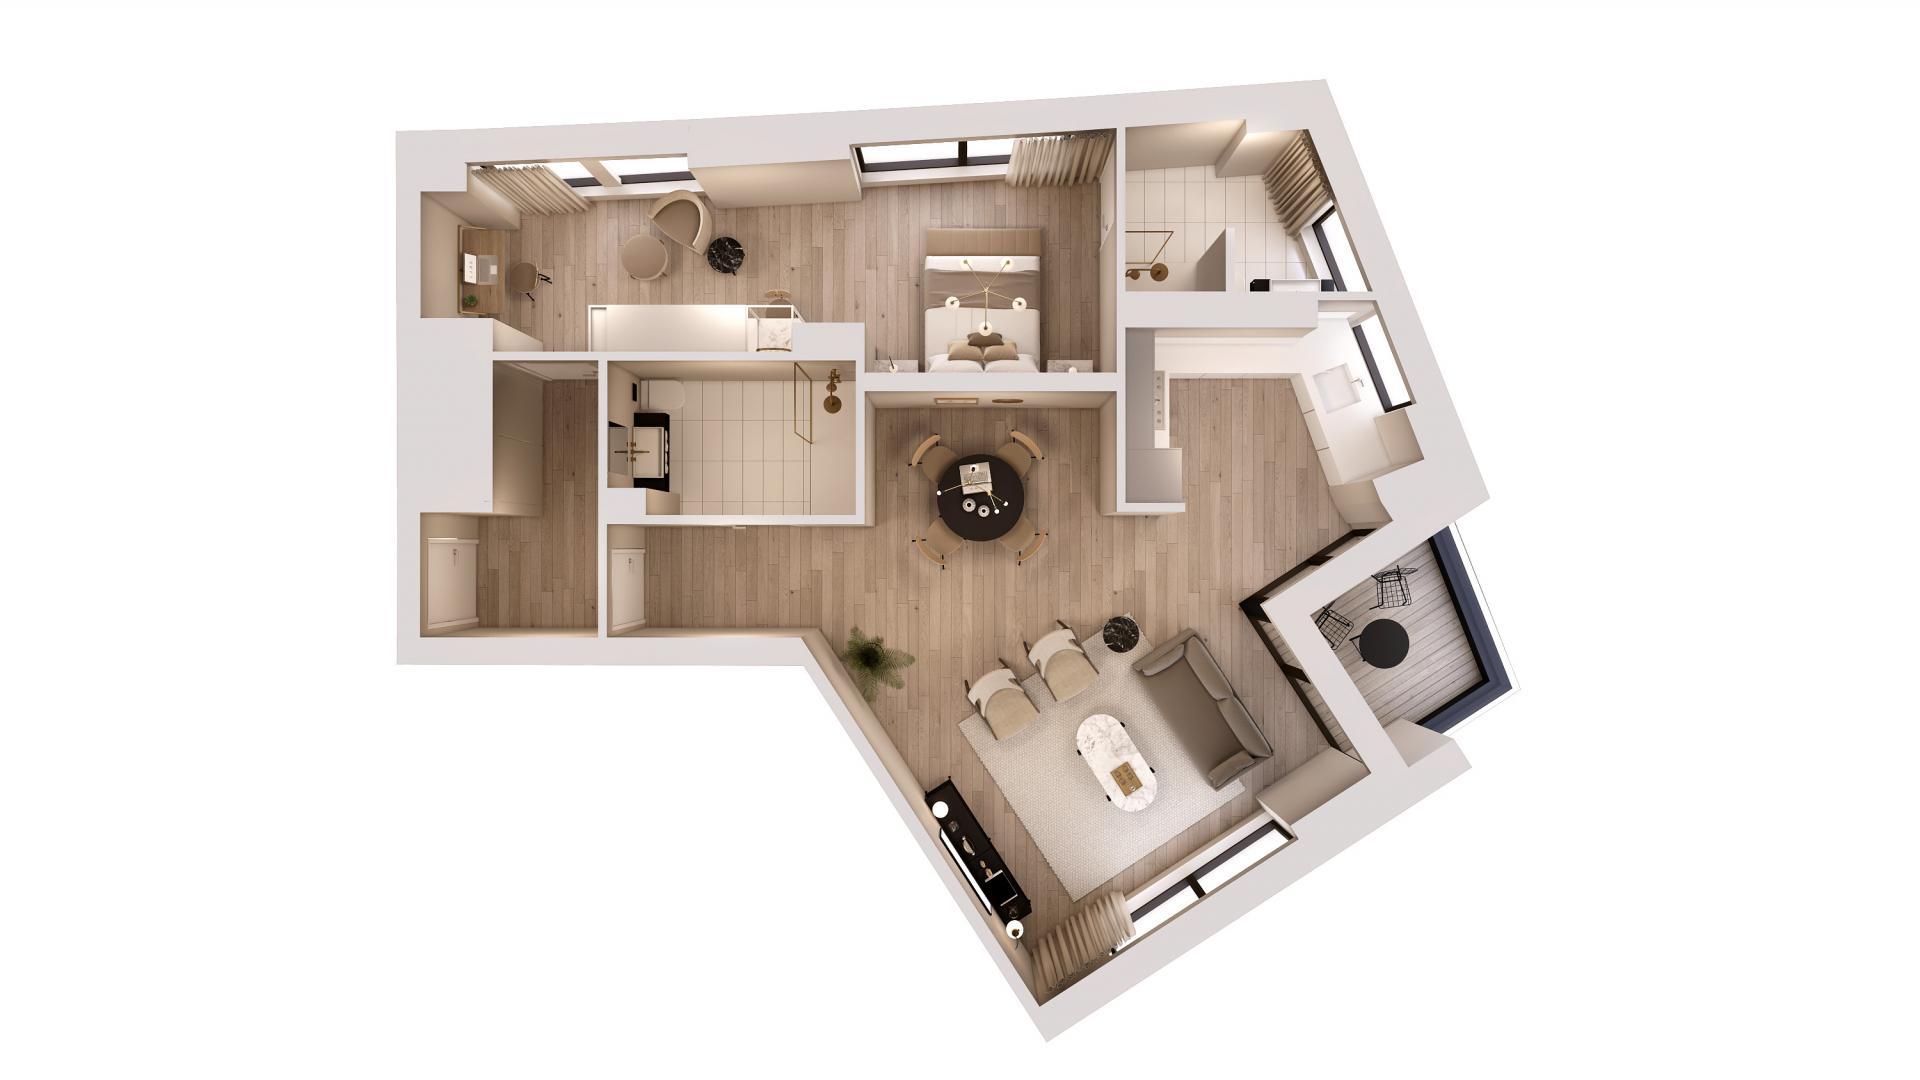 1 bedroom premium floor plan at STAY Camden Serviced Apartments, Camden, London